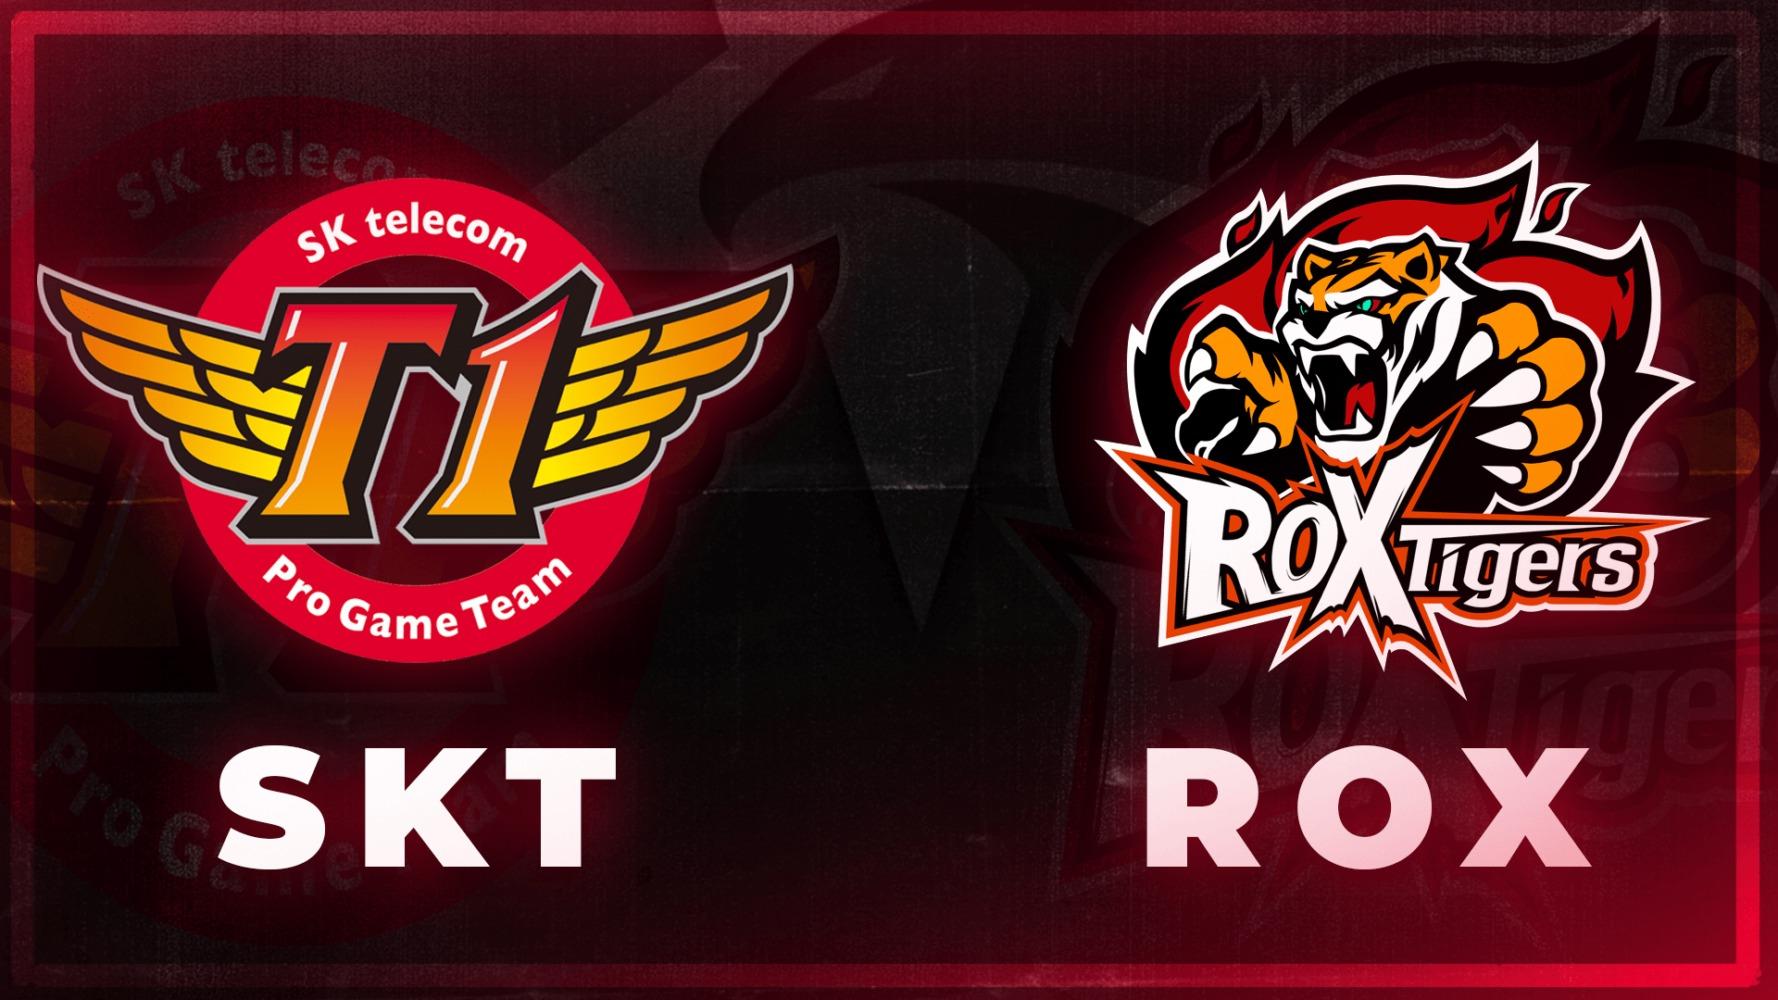 sktt1 vs rox tigers